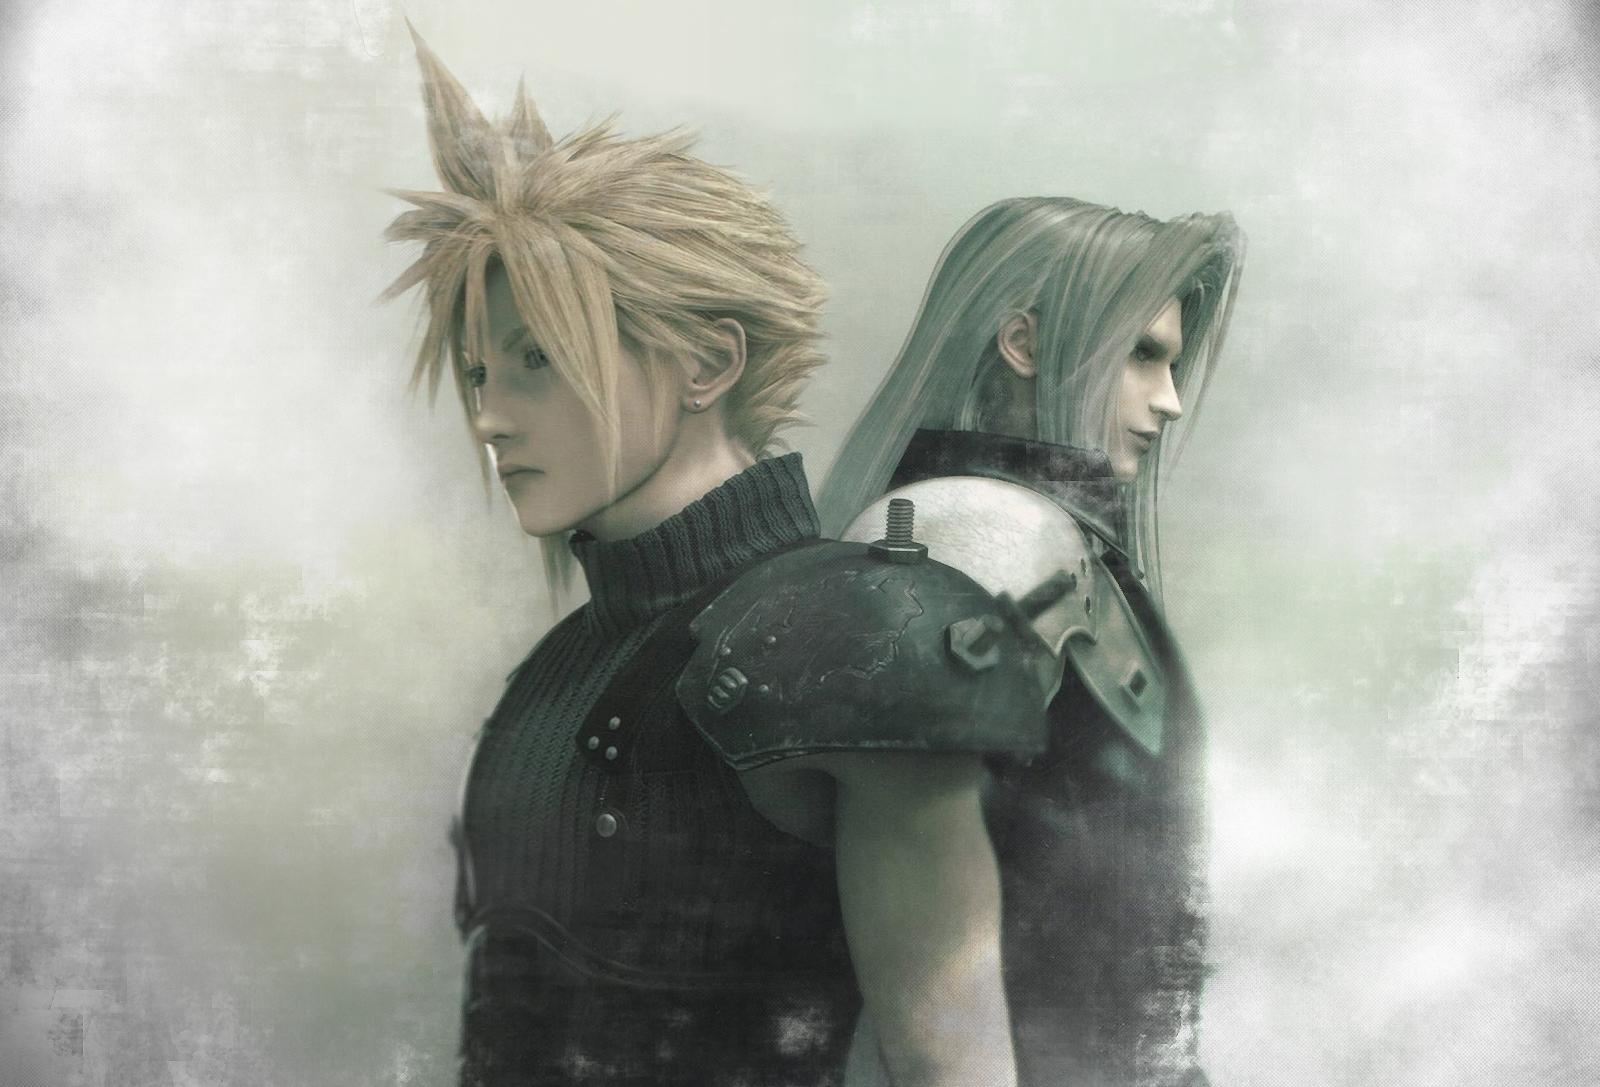 8ss1600wallpapers Final Fantasy VII cloudAC 25794 1600x1200 3294jpg 1600x1087